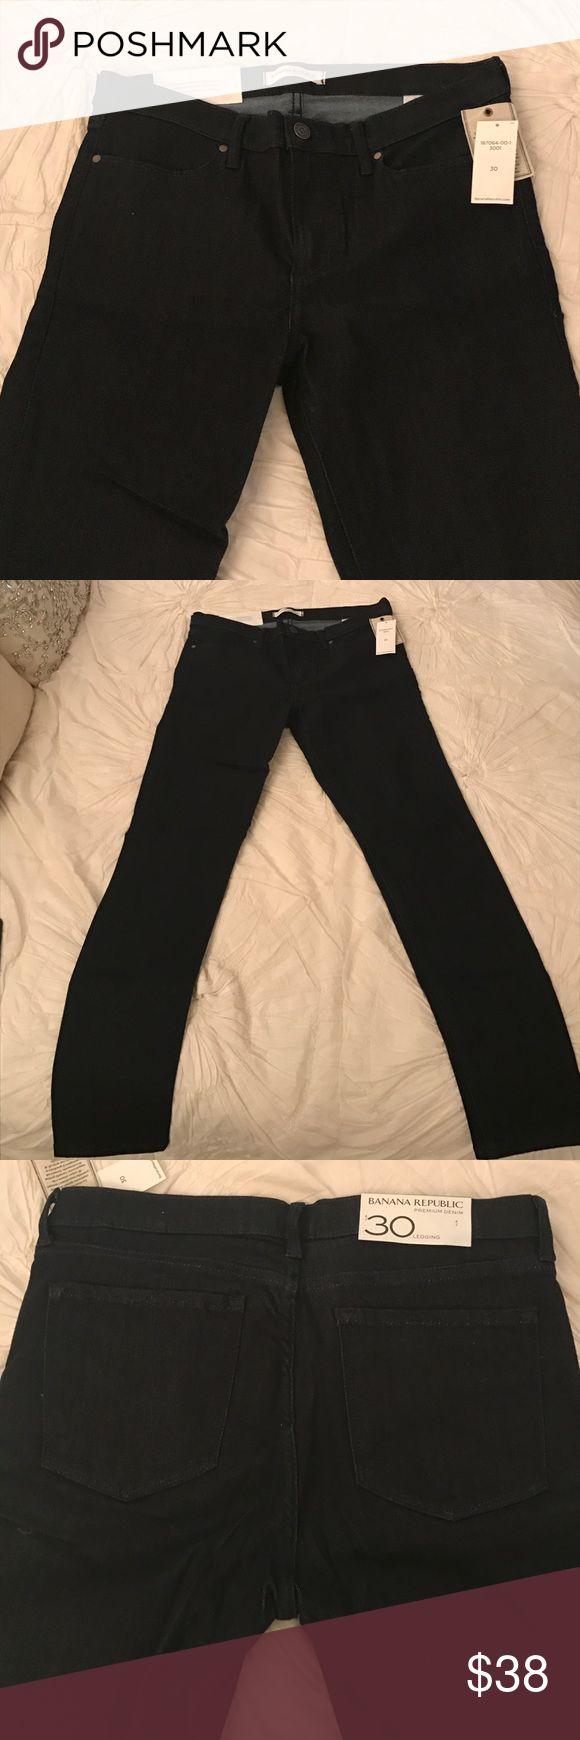 Banana Republic Legging Denim Legging jeans. Never worn, still have tags on them. Beautiful denim with good stretch. Mid rise size 30 Banana Republic Jeans Skinny